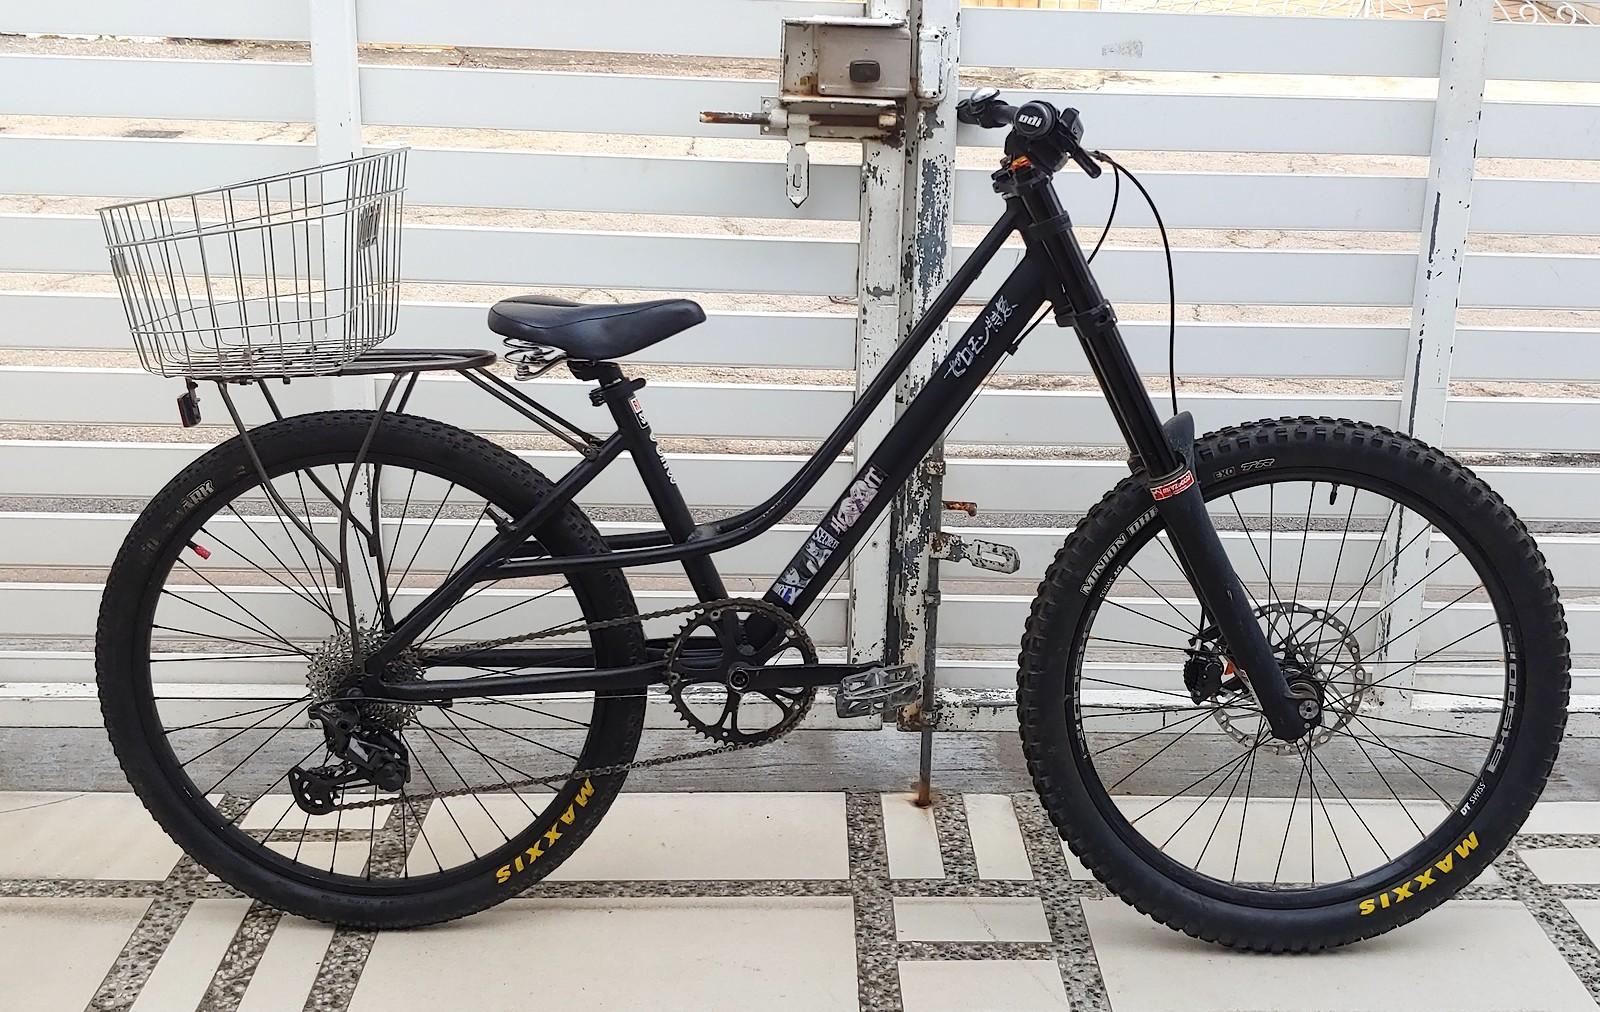 DH City Bike - Vital Bike of the Day January 2021 - Mountain Biking Pictures - Vital MTB